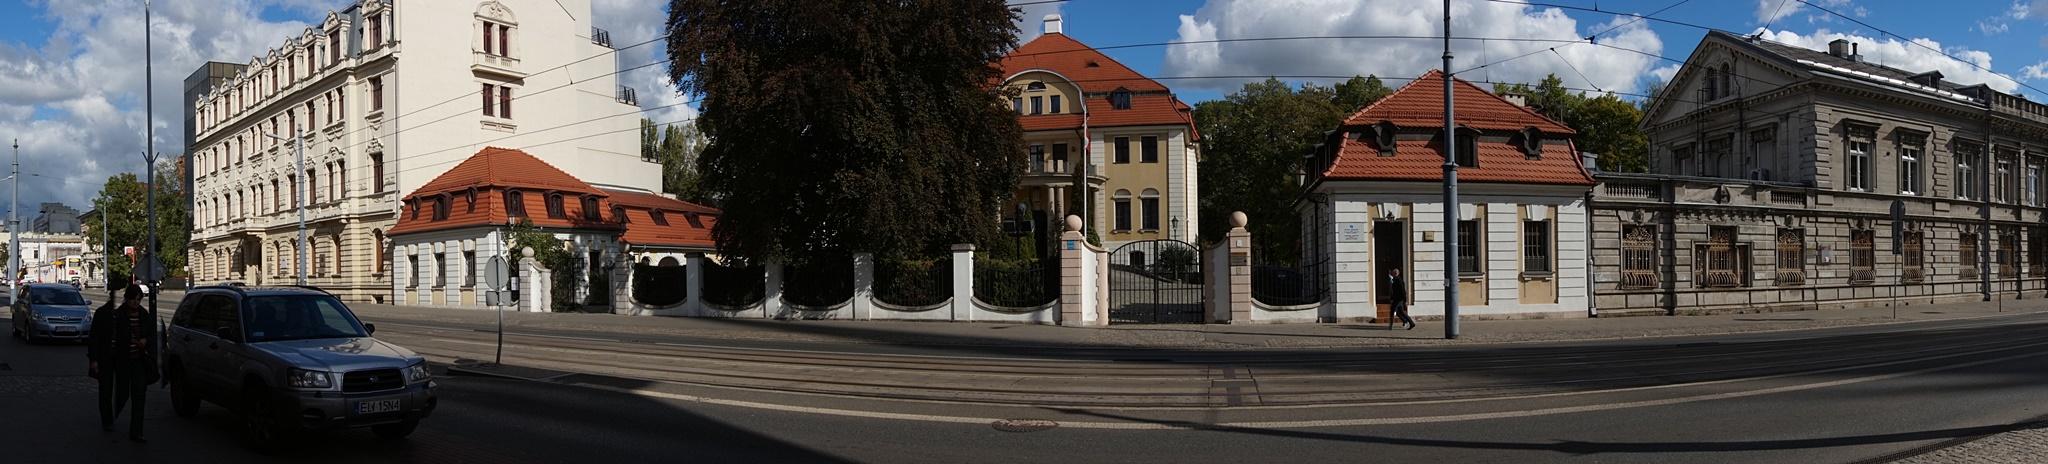 Piotrkowska 9